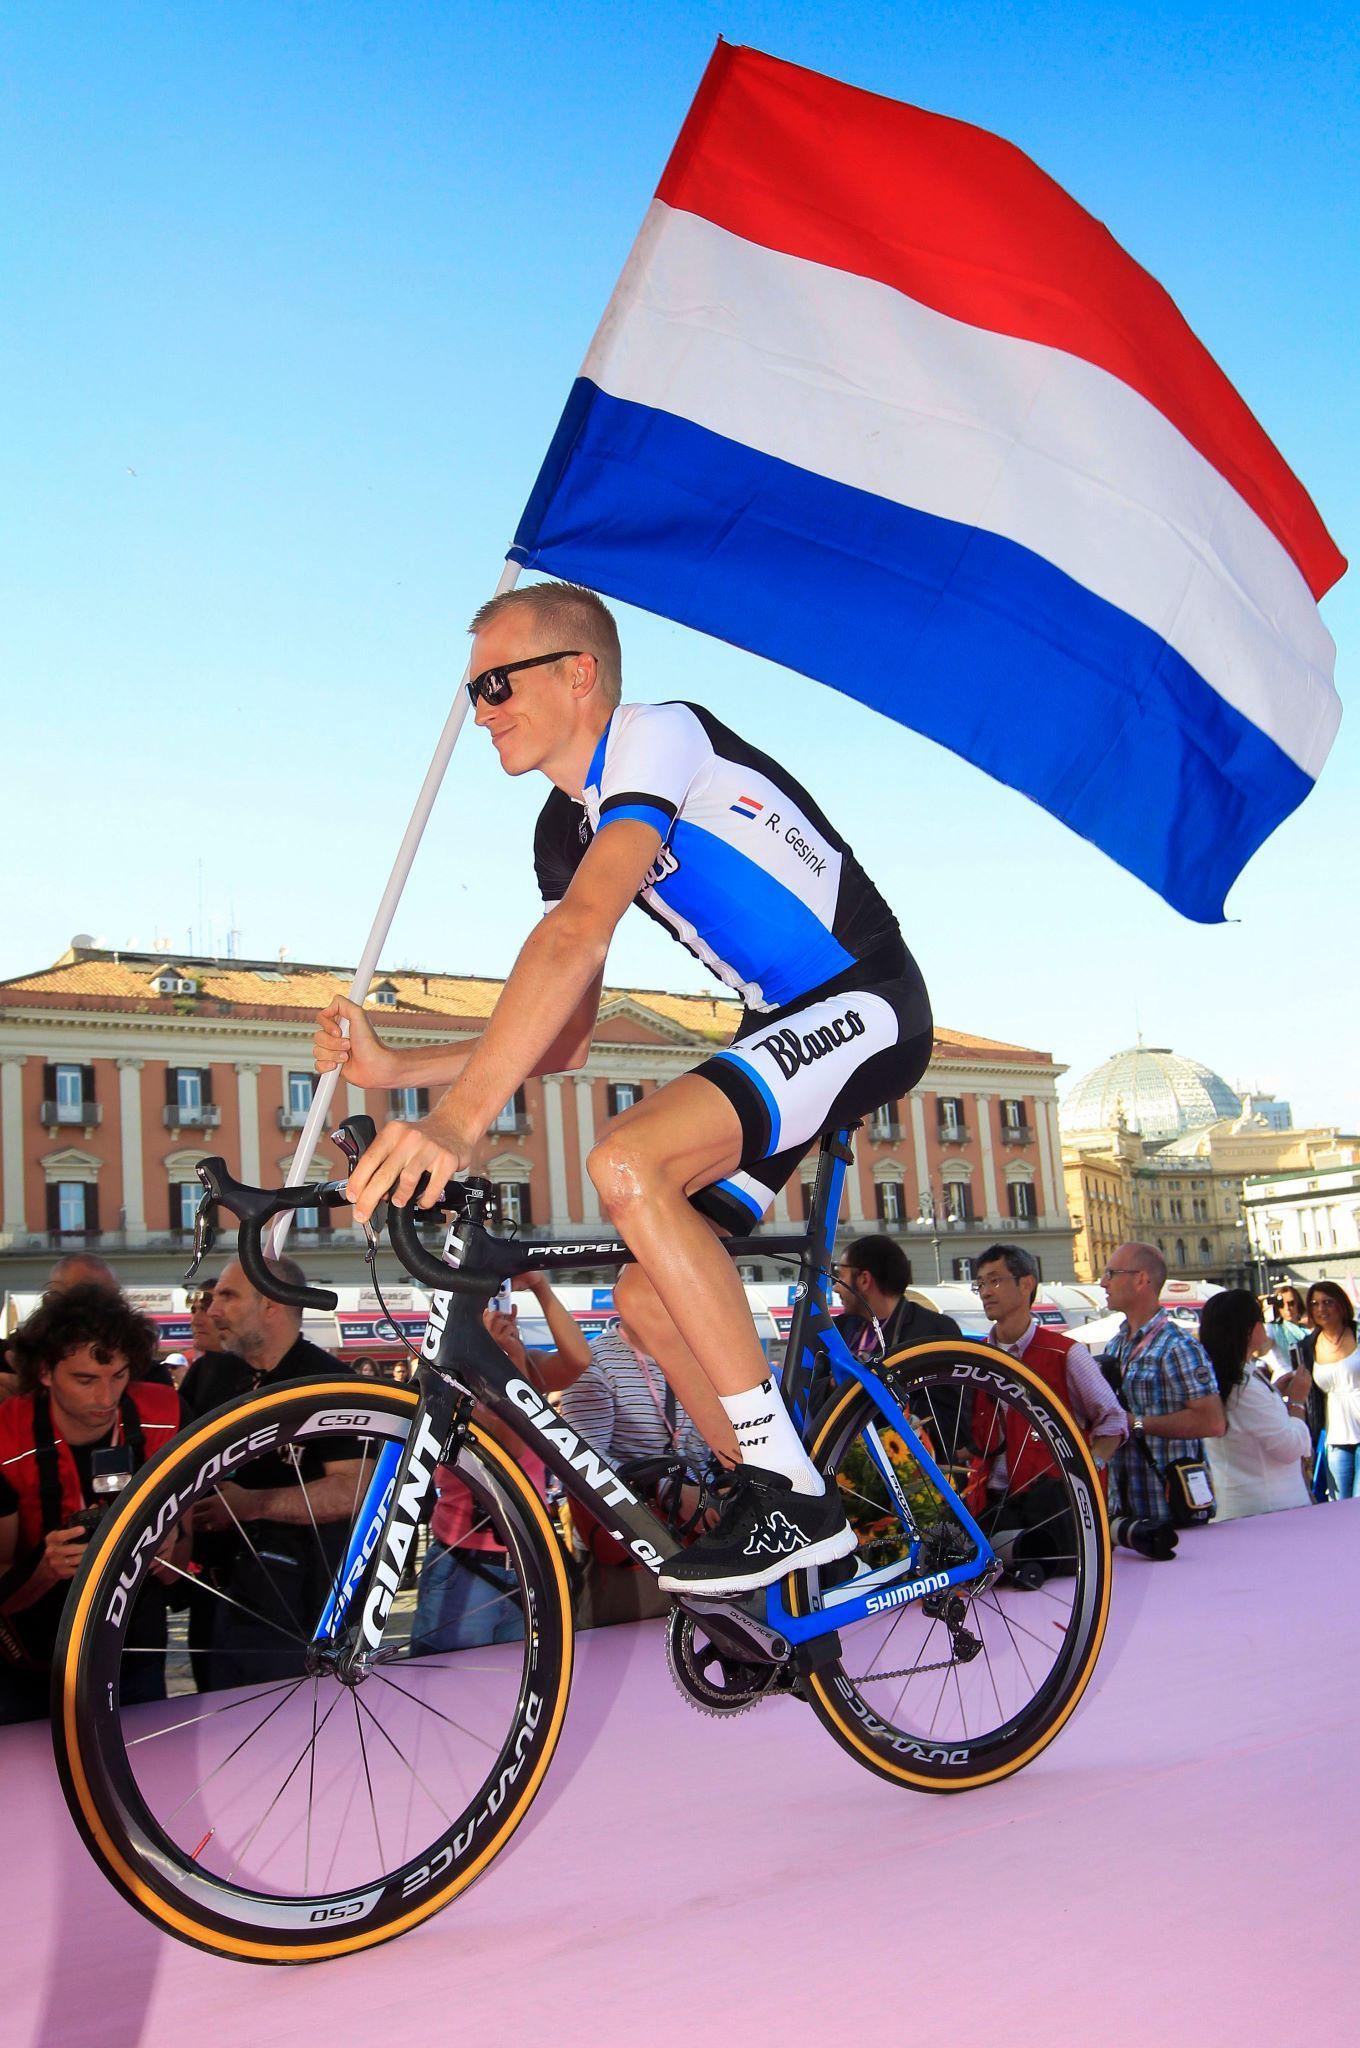 Robert Gesink Of Team Blanco Pro Cycling Carrying The Dutch Flag Pro Cycling Cyclist Cycling